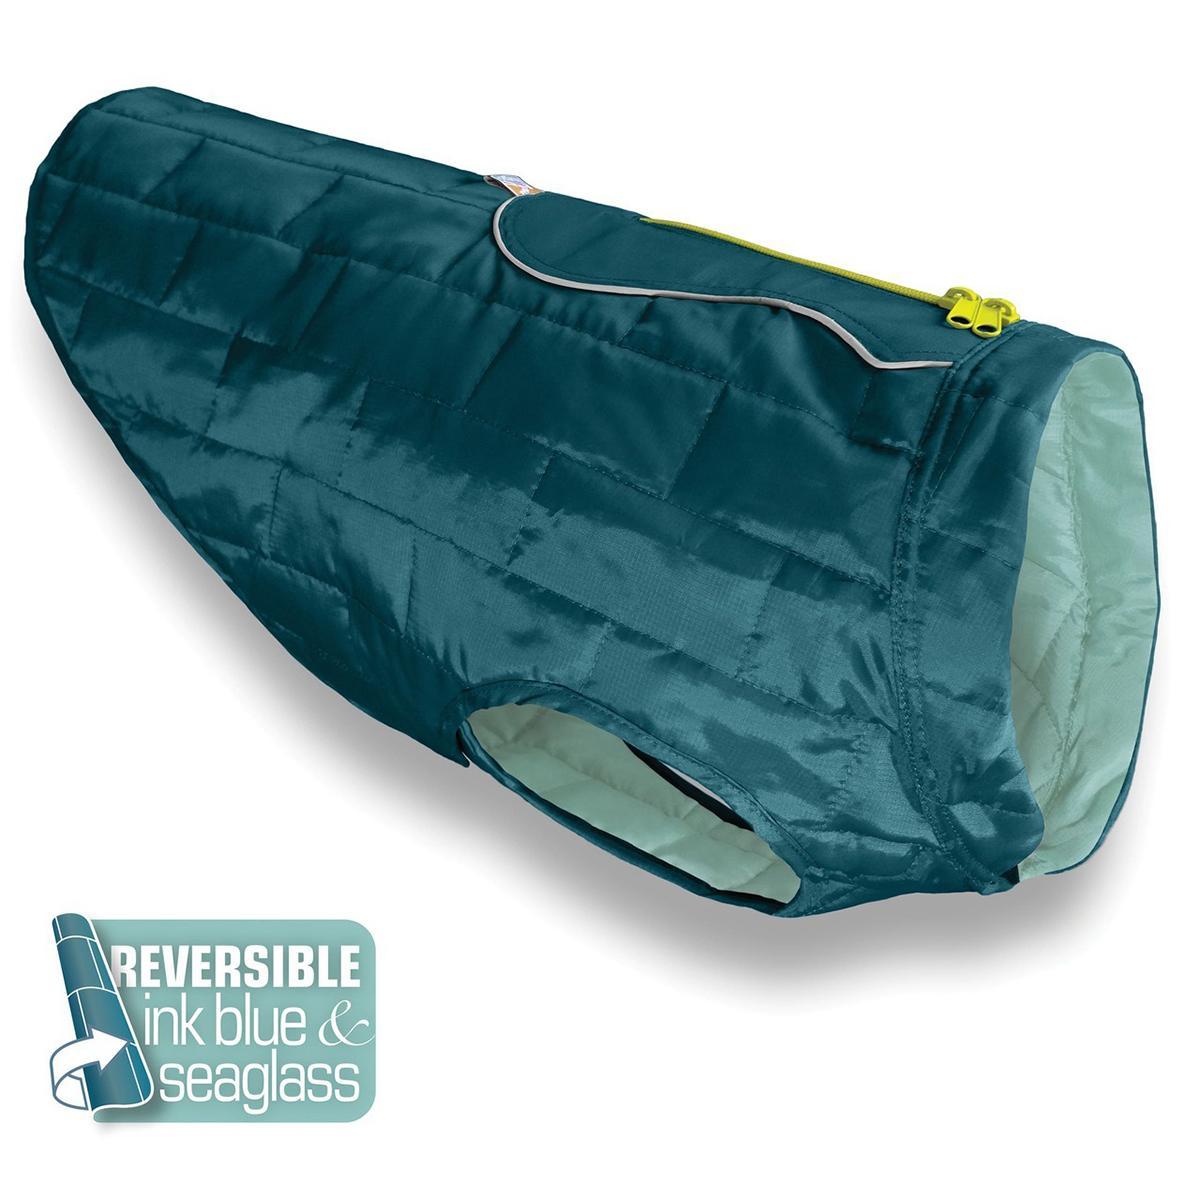 Kurgo Loft Reversible Dog Jacket - Ink Blue and Sea Glass